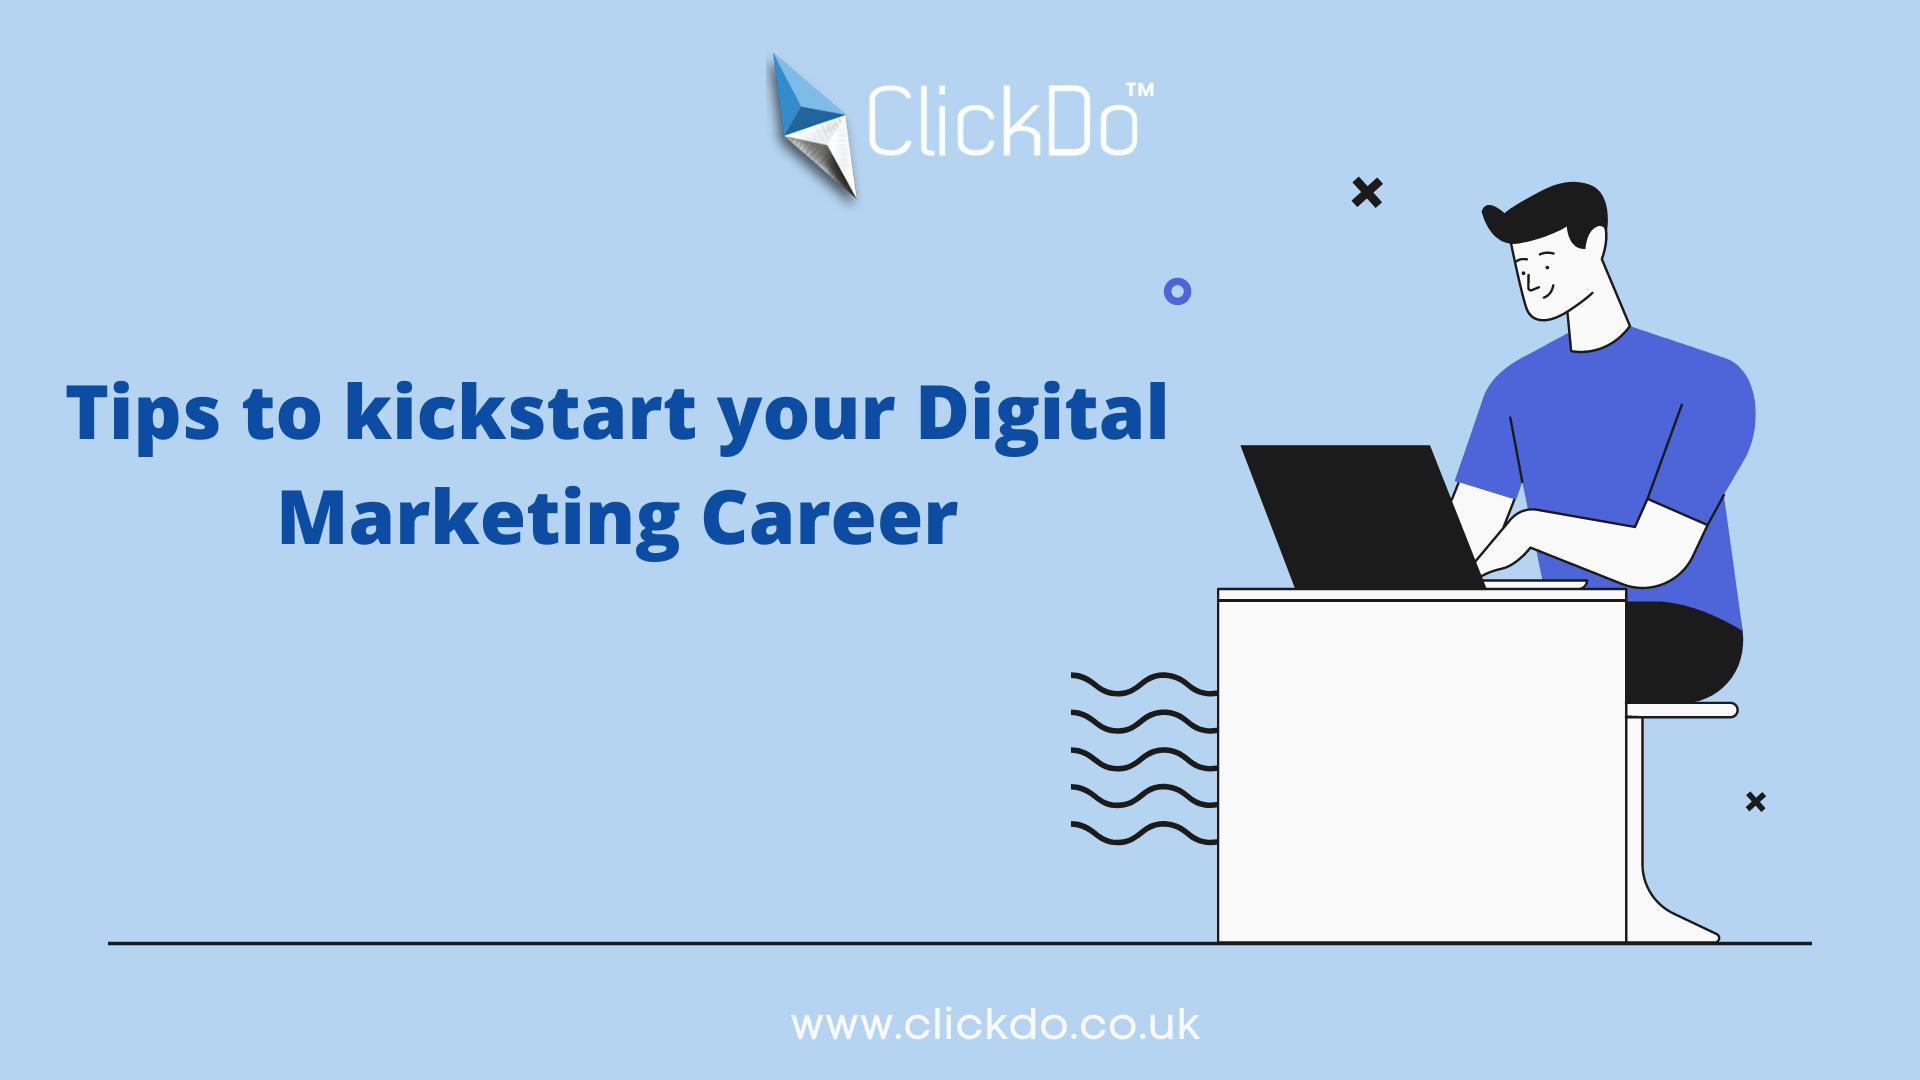 Tips to kickstart your Digital Marketing Career